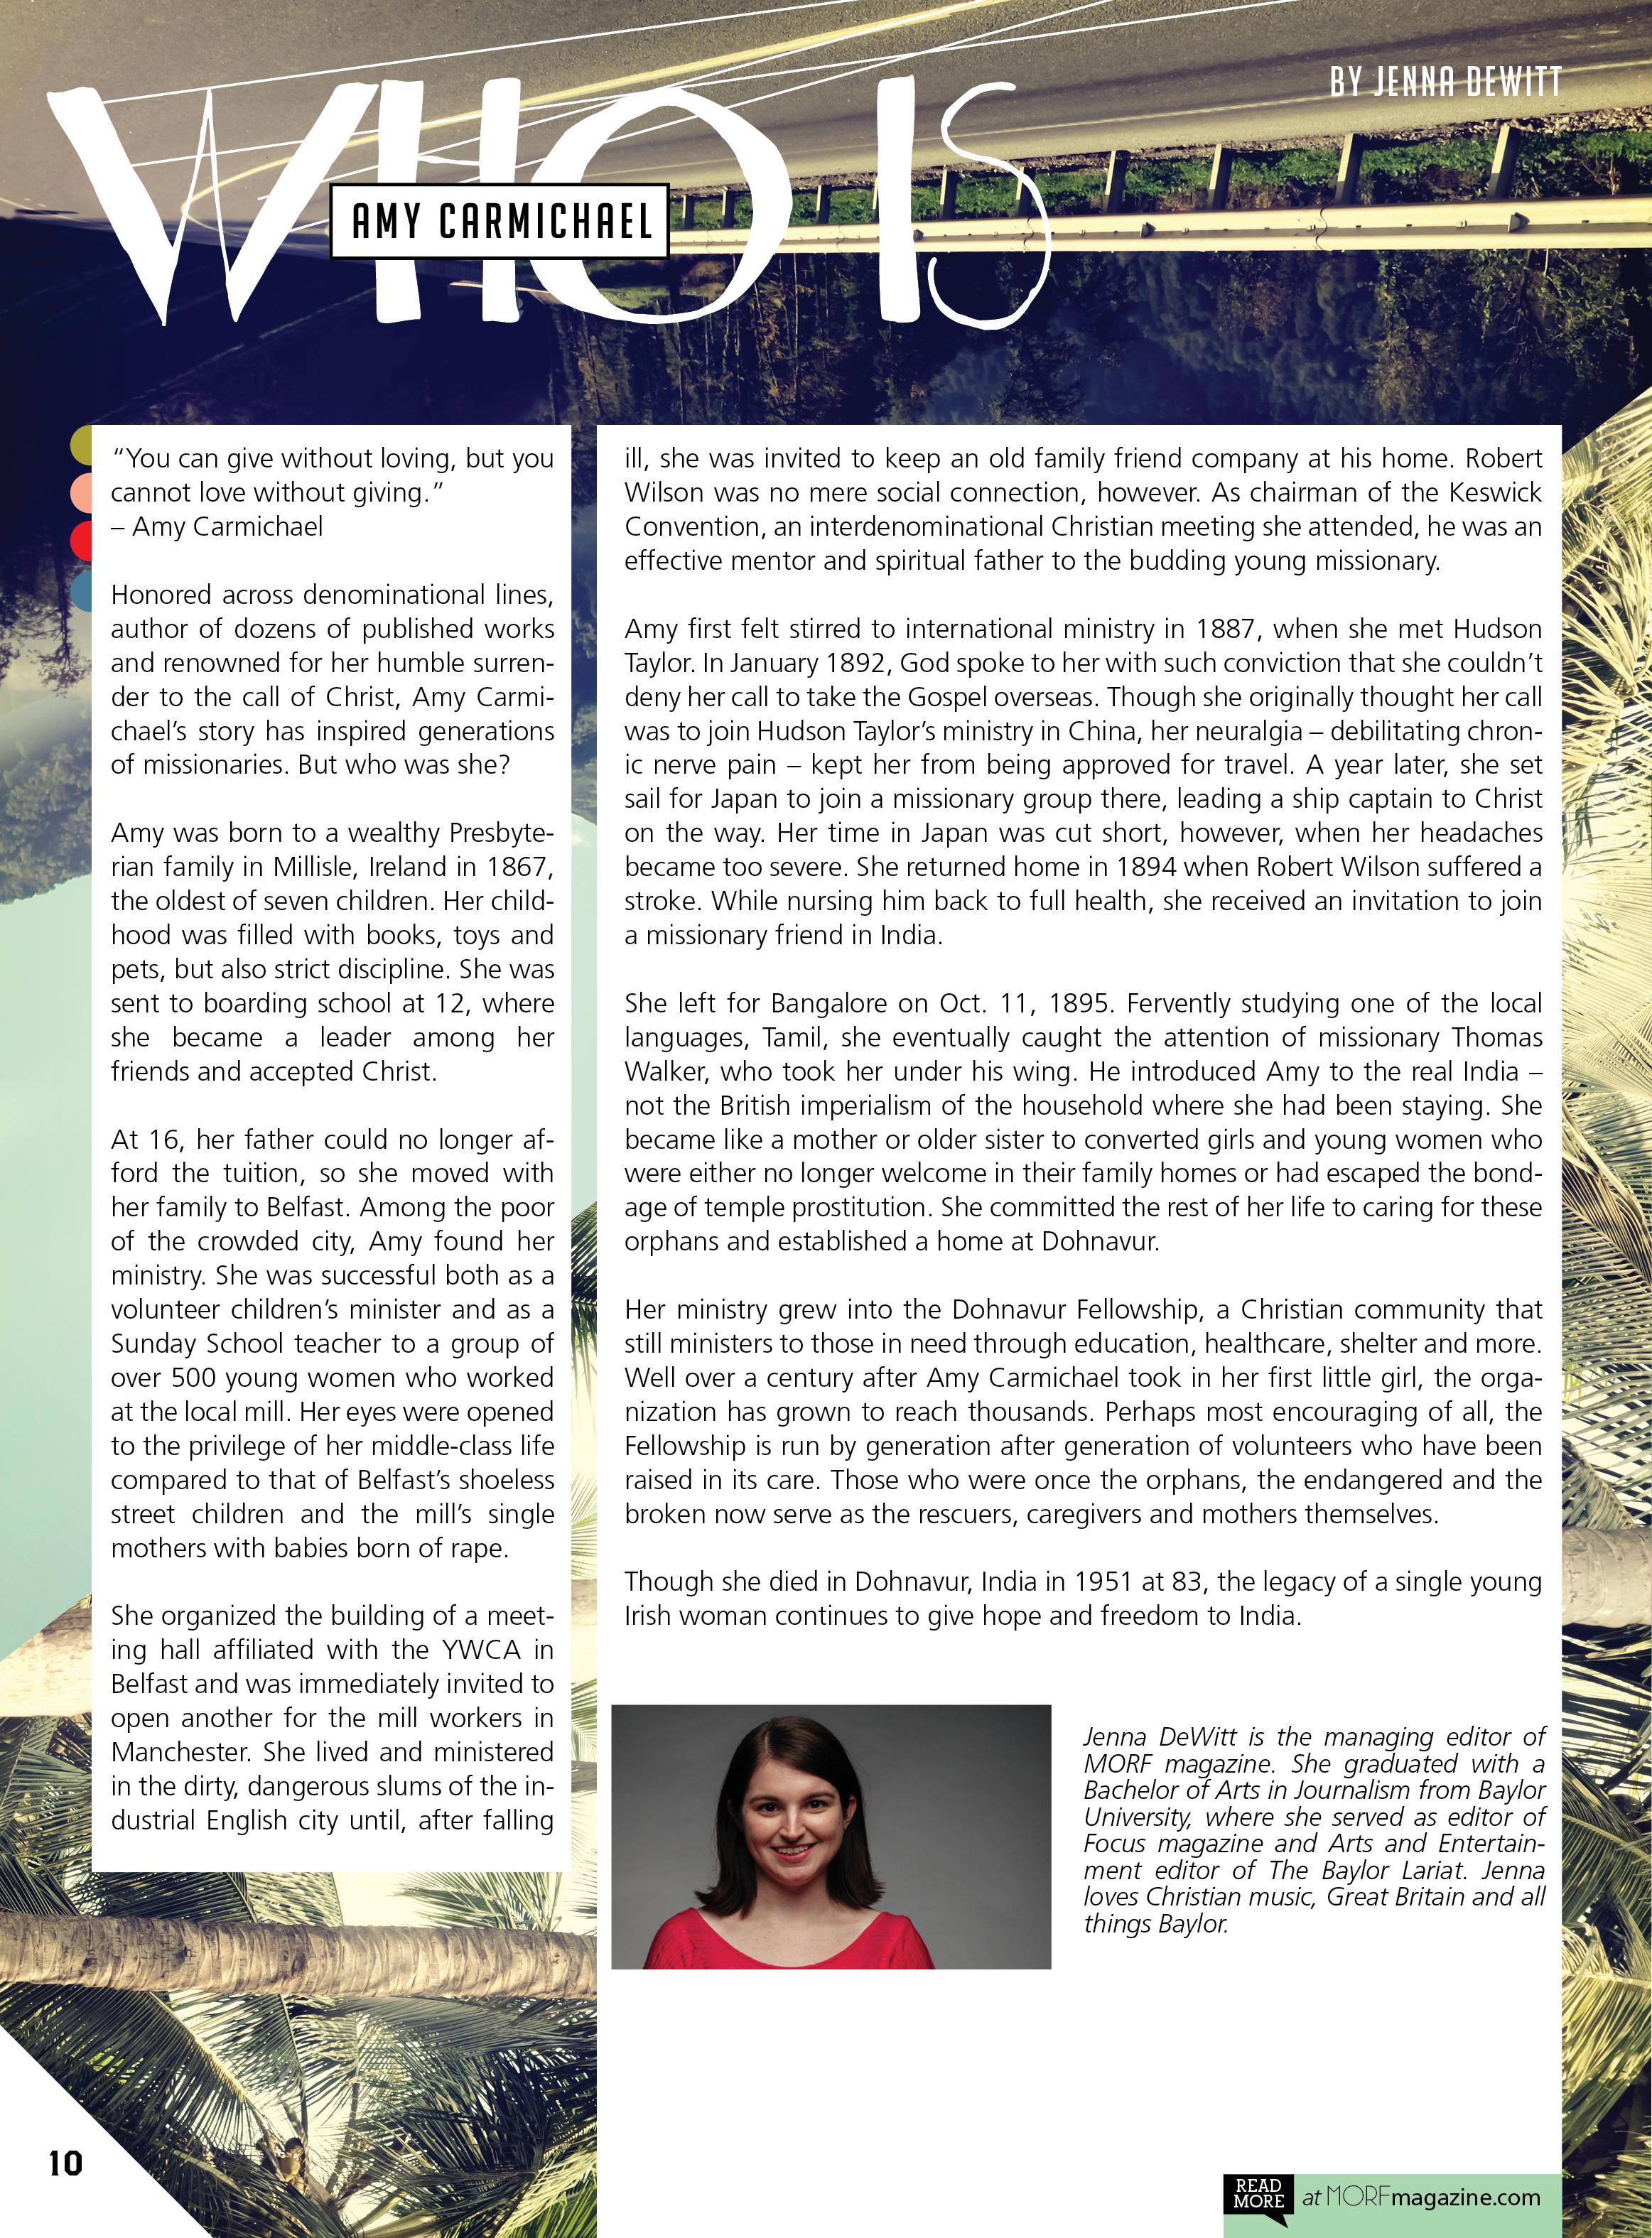 MORF Magazine – Jenna DeWitt